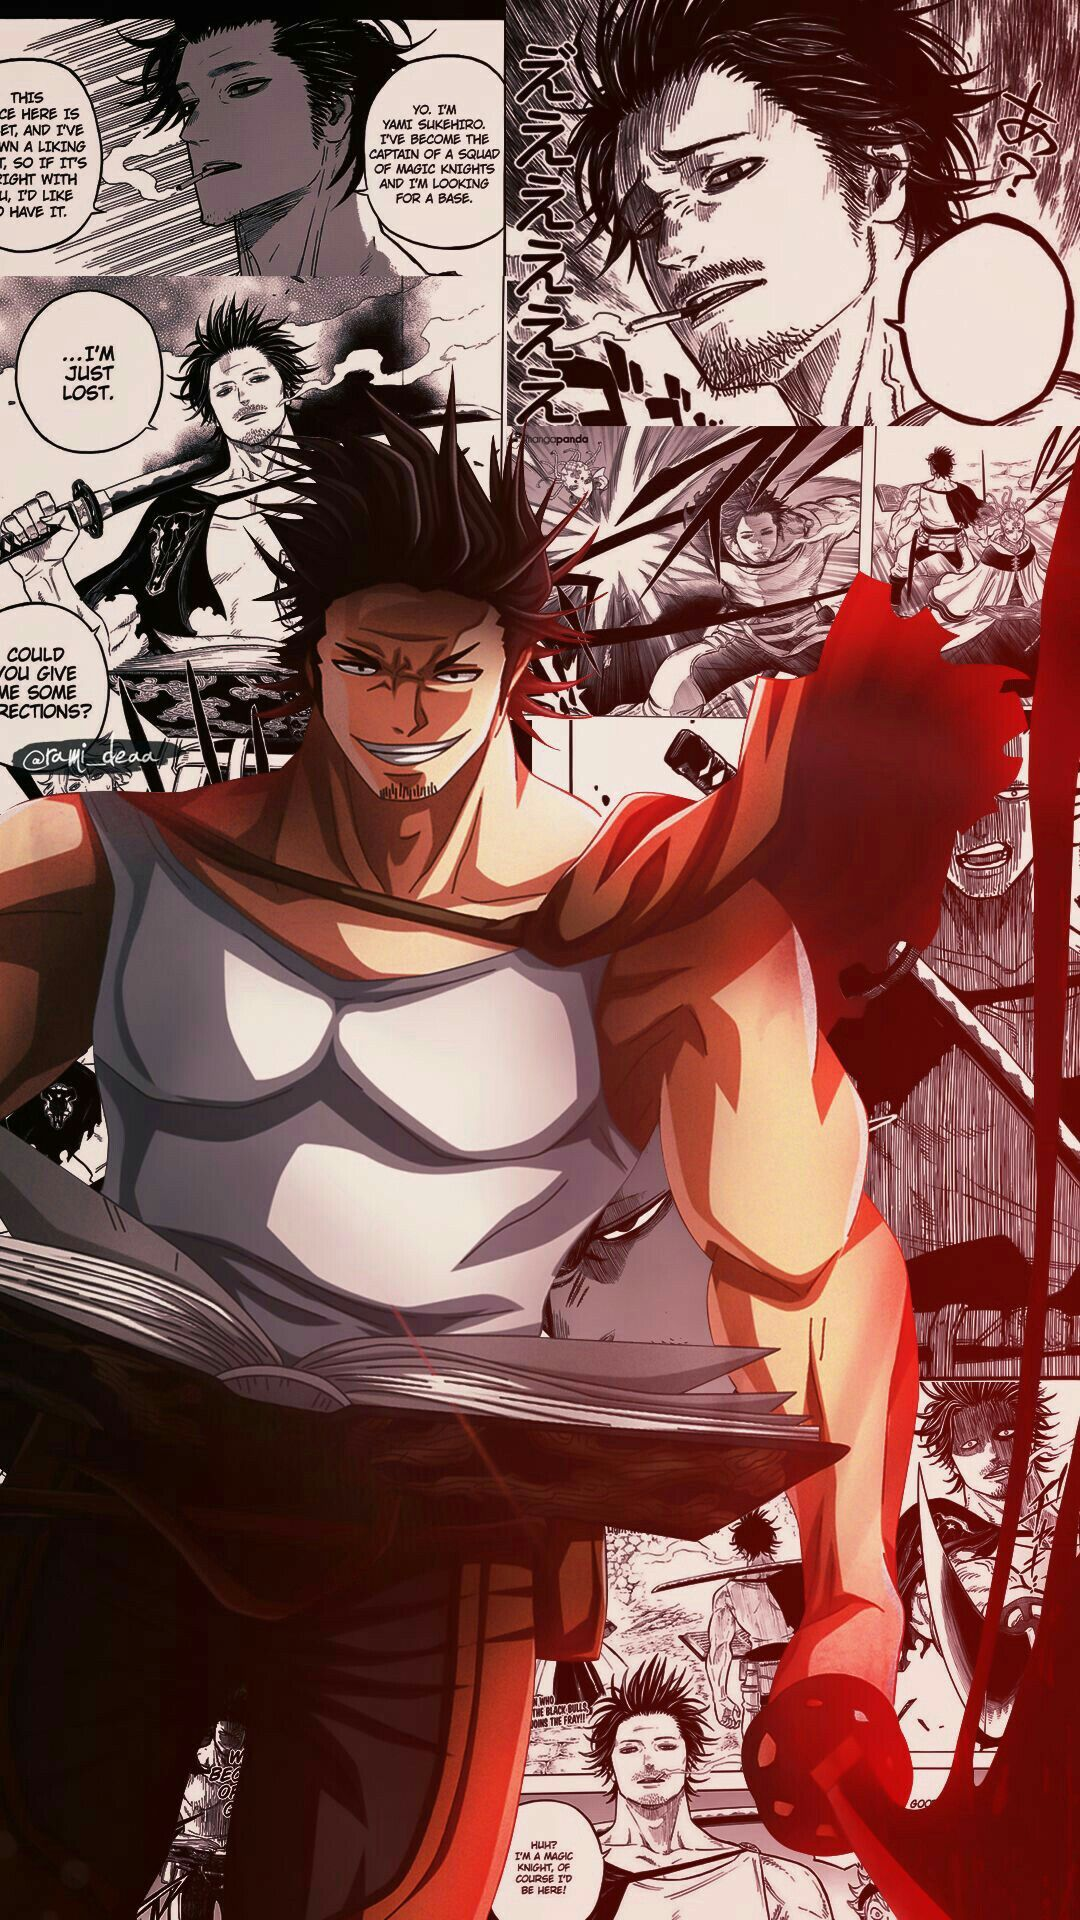 Pin De Moataz Alawady Em Black Clover Em 2020 Manga Wallpaper Animes Wallpapers Animes Manga